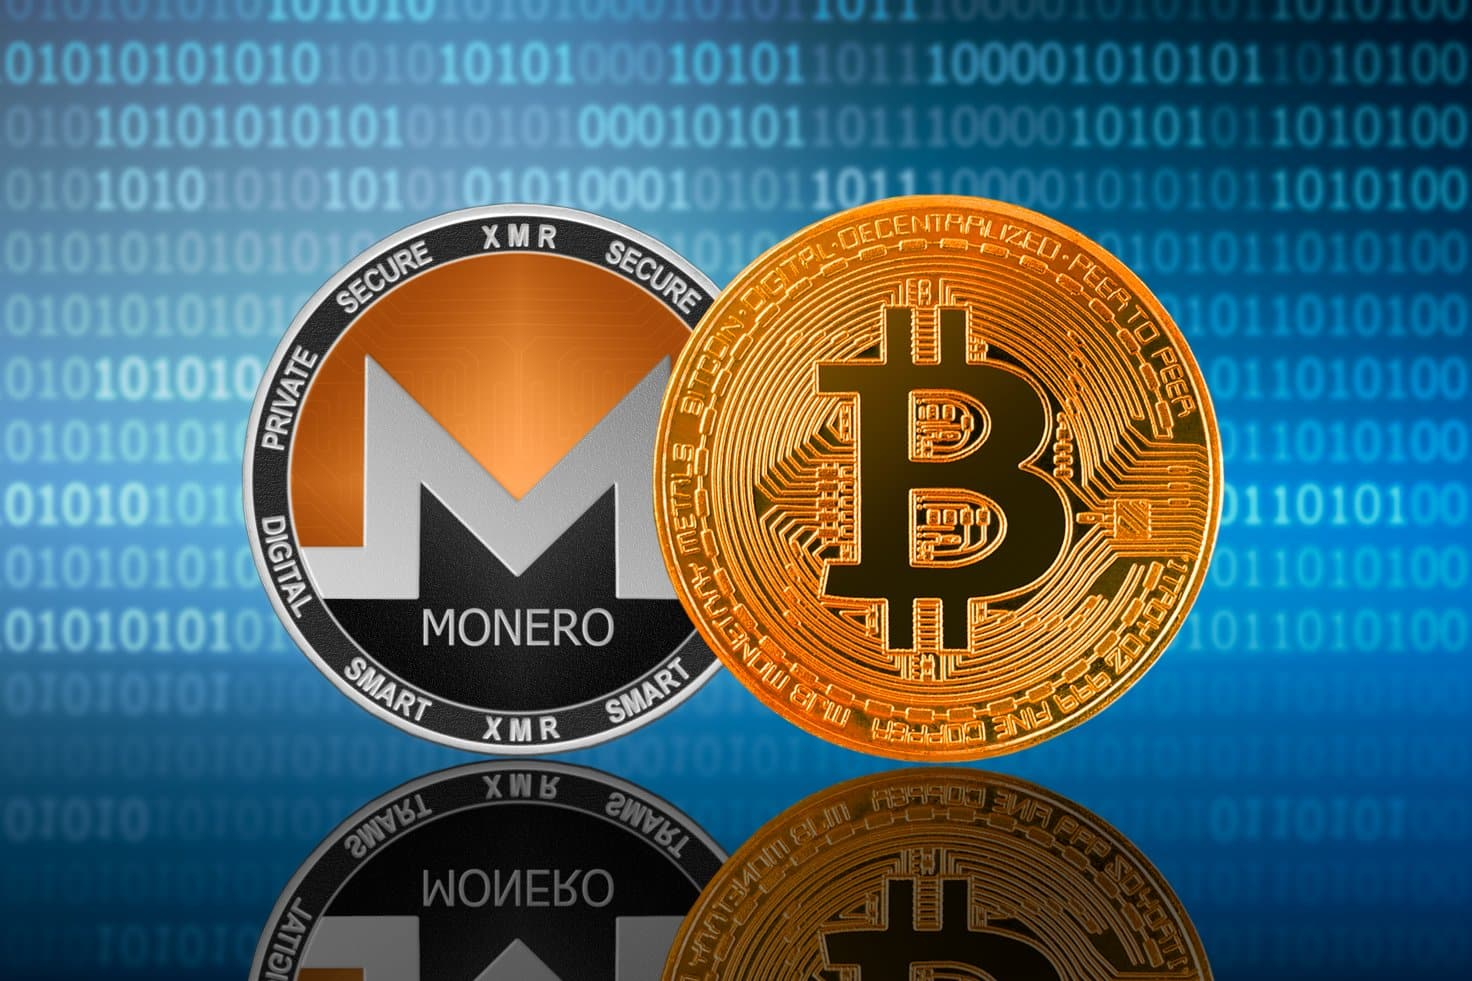 ethereum: ¡una mirada al mundo de ethereum y cómo comerciar e invertir esta criptomoneda! investir em monero ou bitcoins